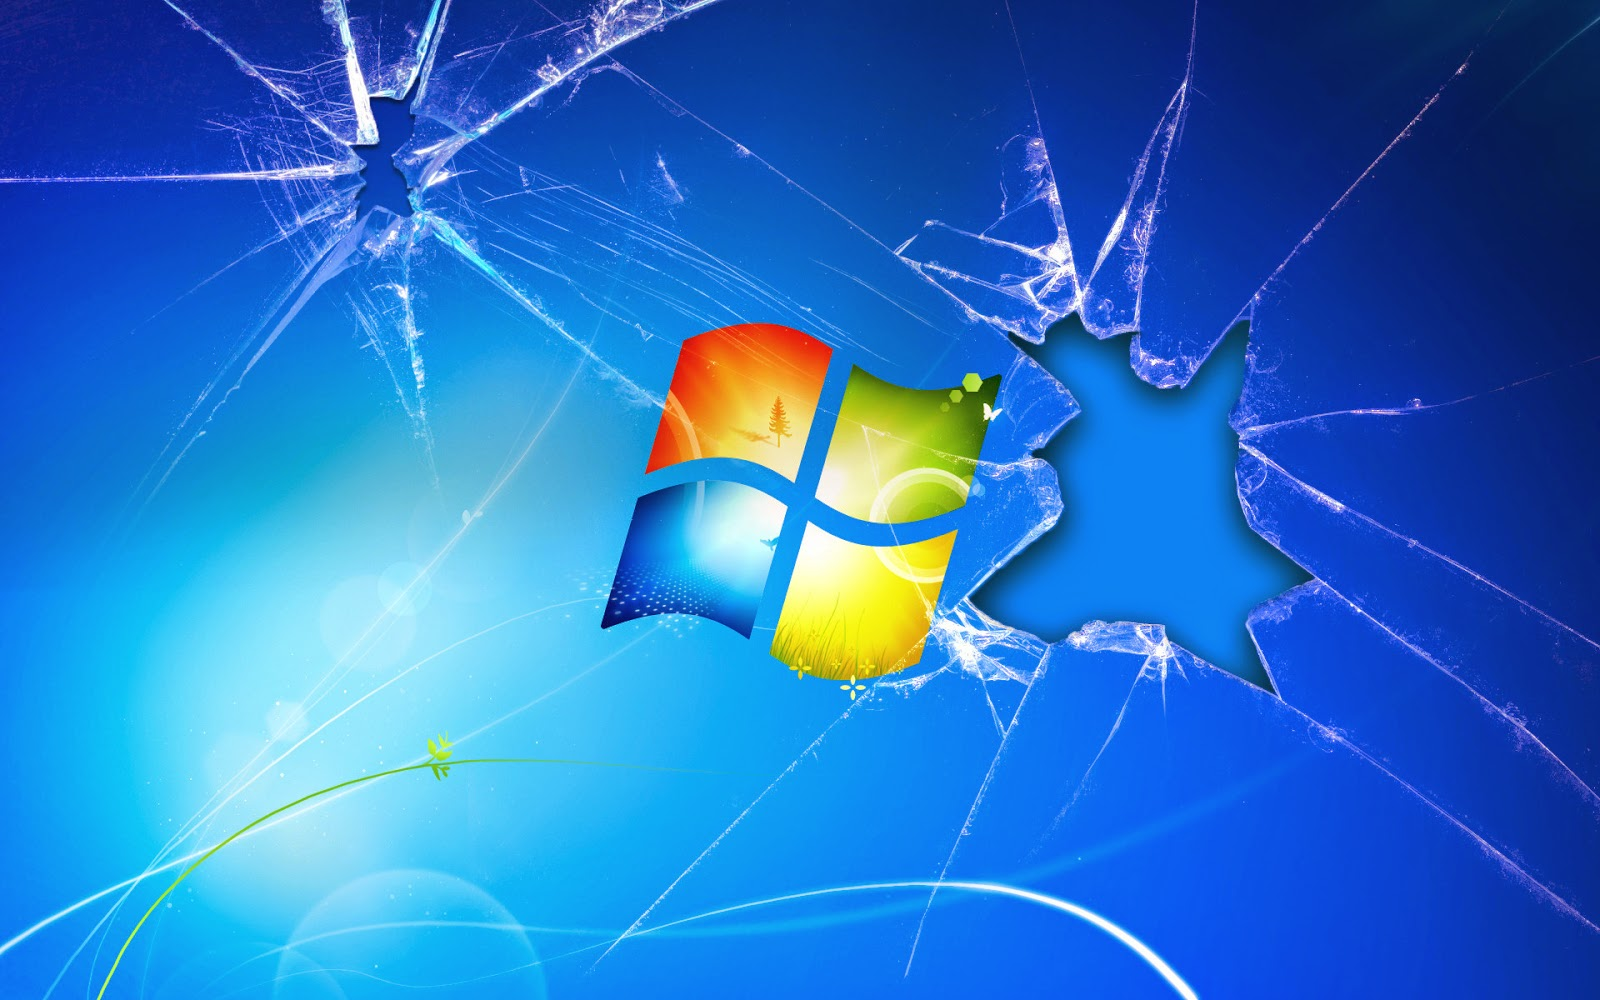 Crack etabs 9 5 Windows 8 rar